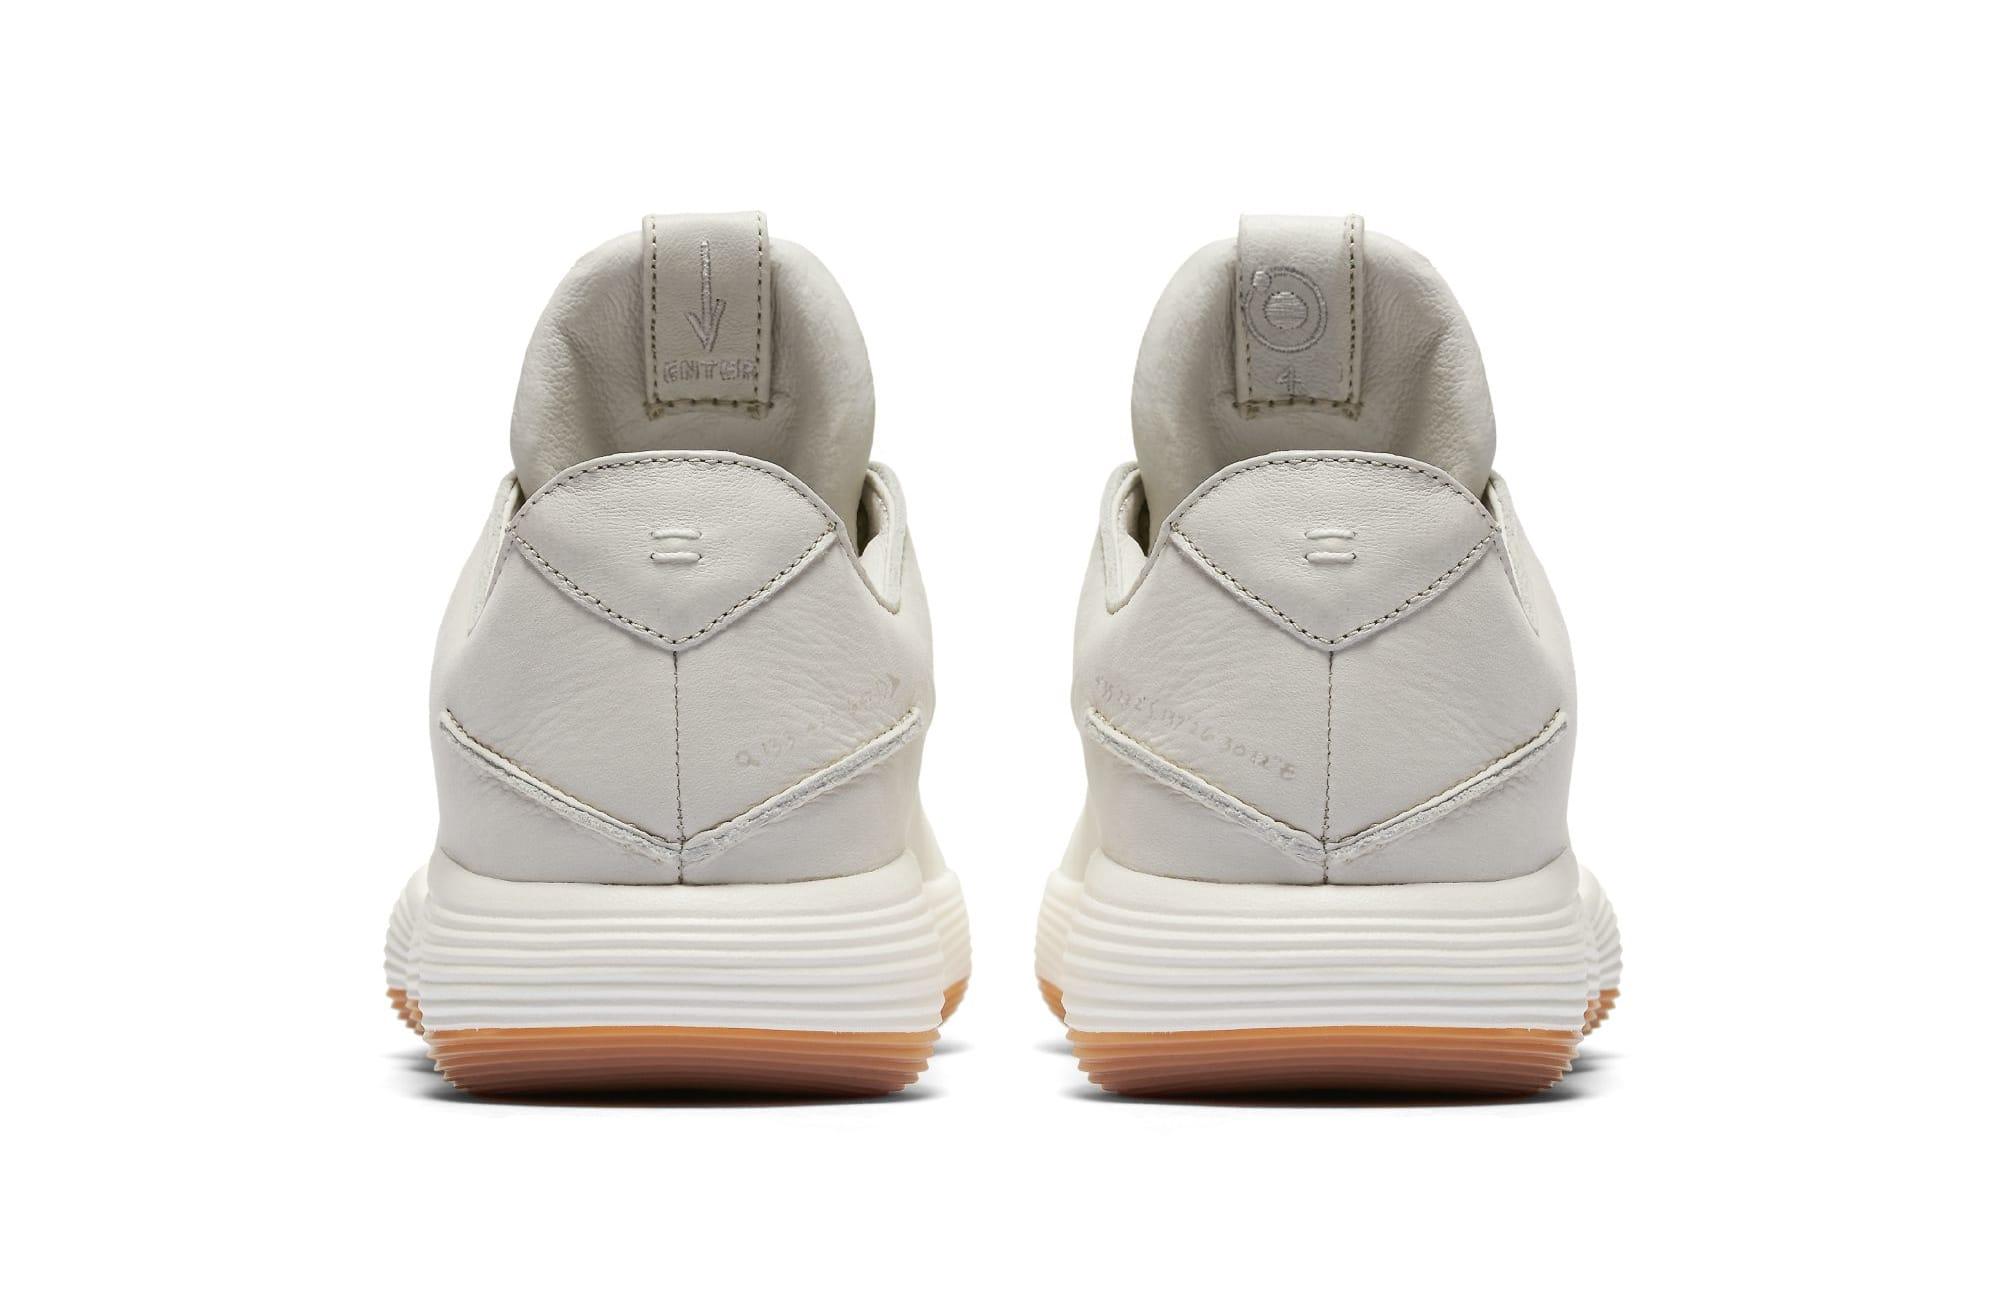 half off e2d7b 2de95 Image via US11 Nike Hyperdunk 2017 Low Lifestyle White (Heel)